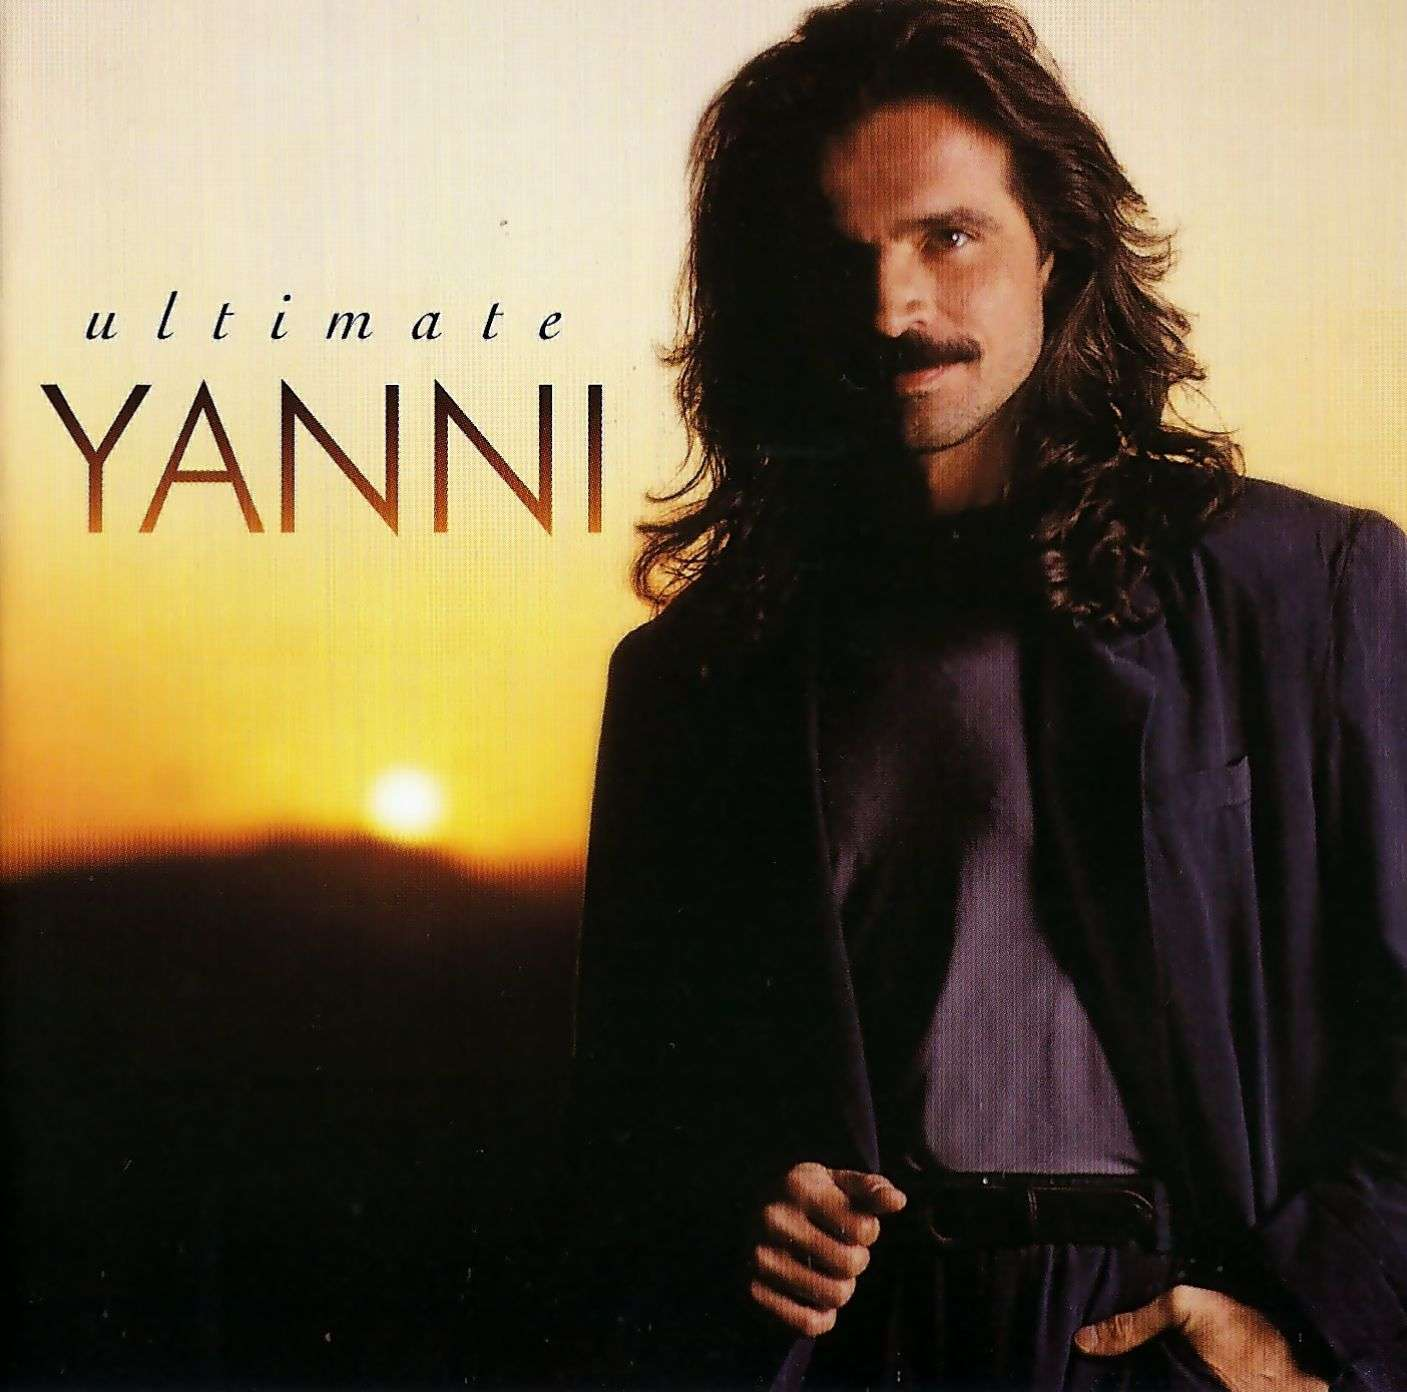 Yanni《Ultimate YANNI》[CD级无损/44.1kHz/16bit]